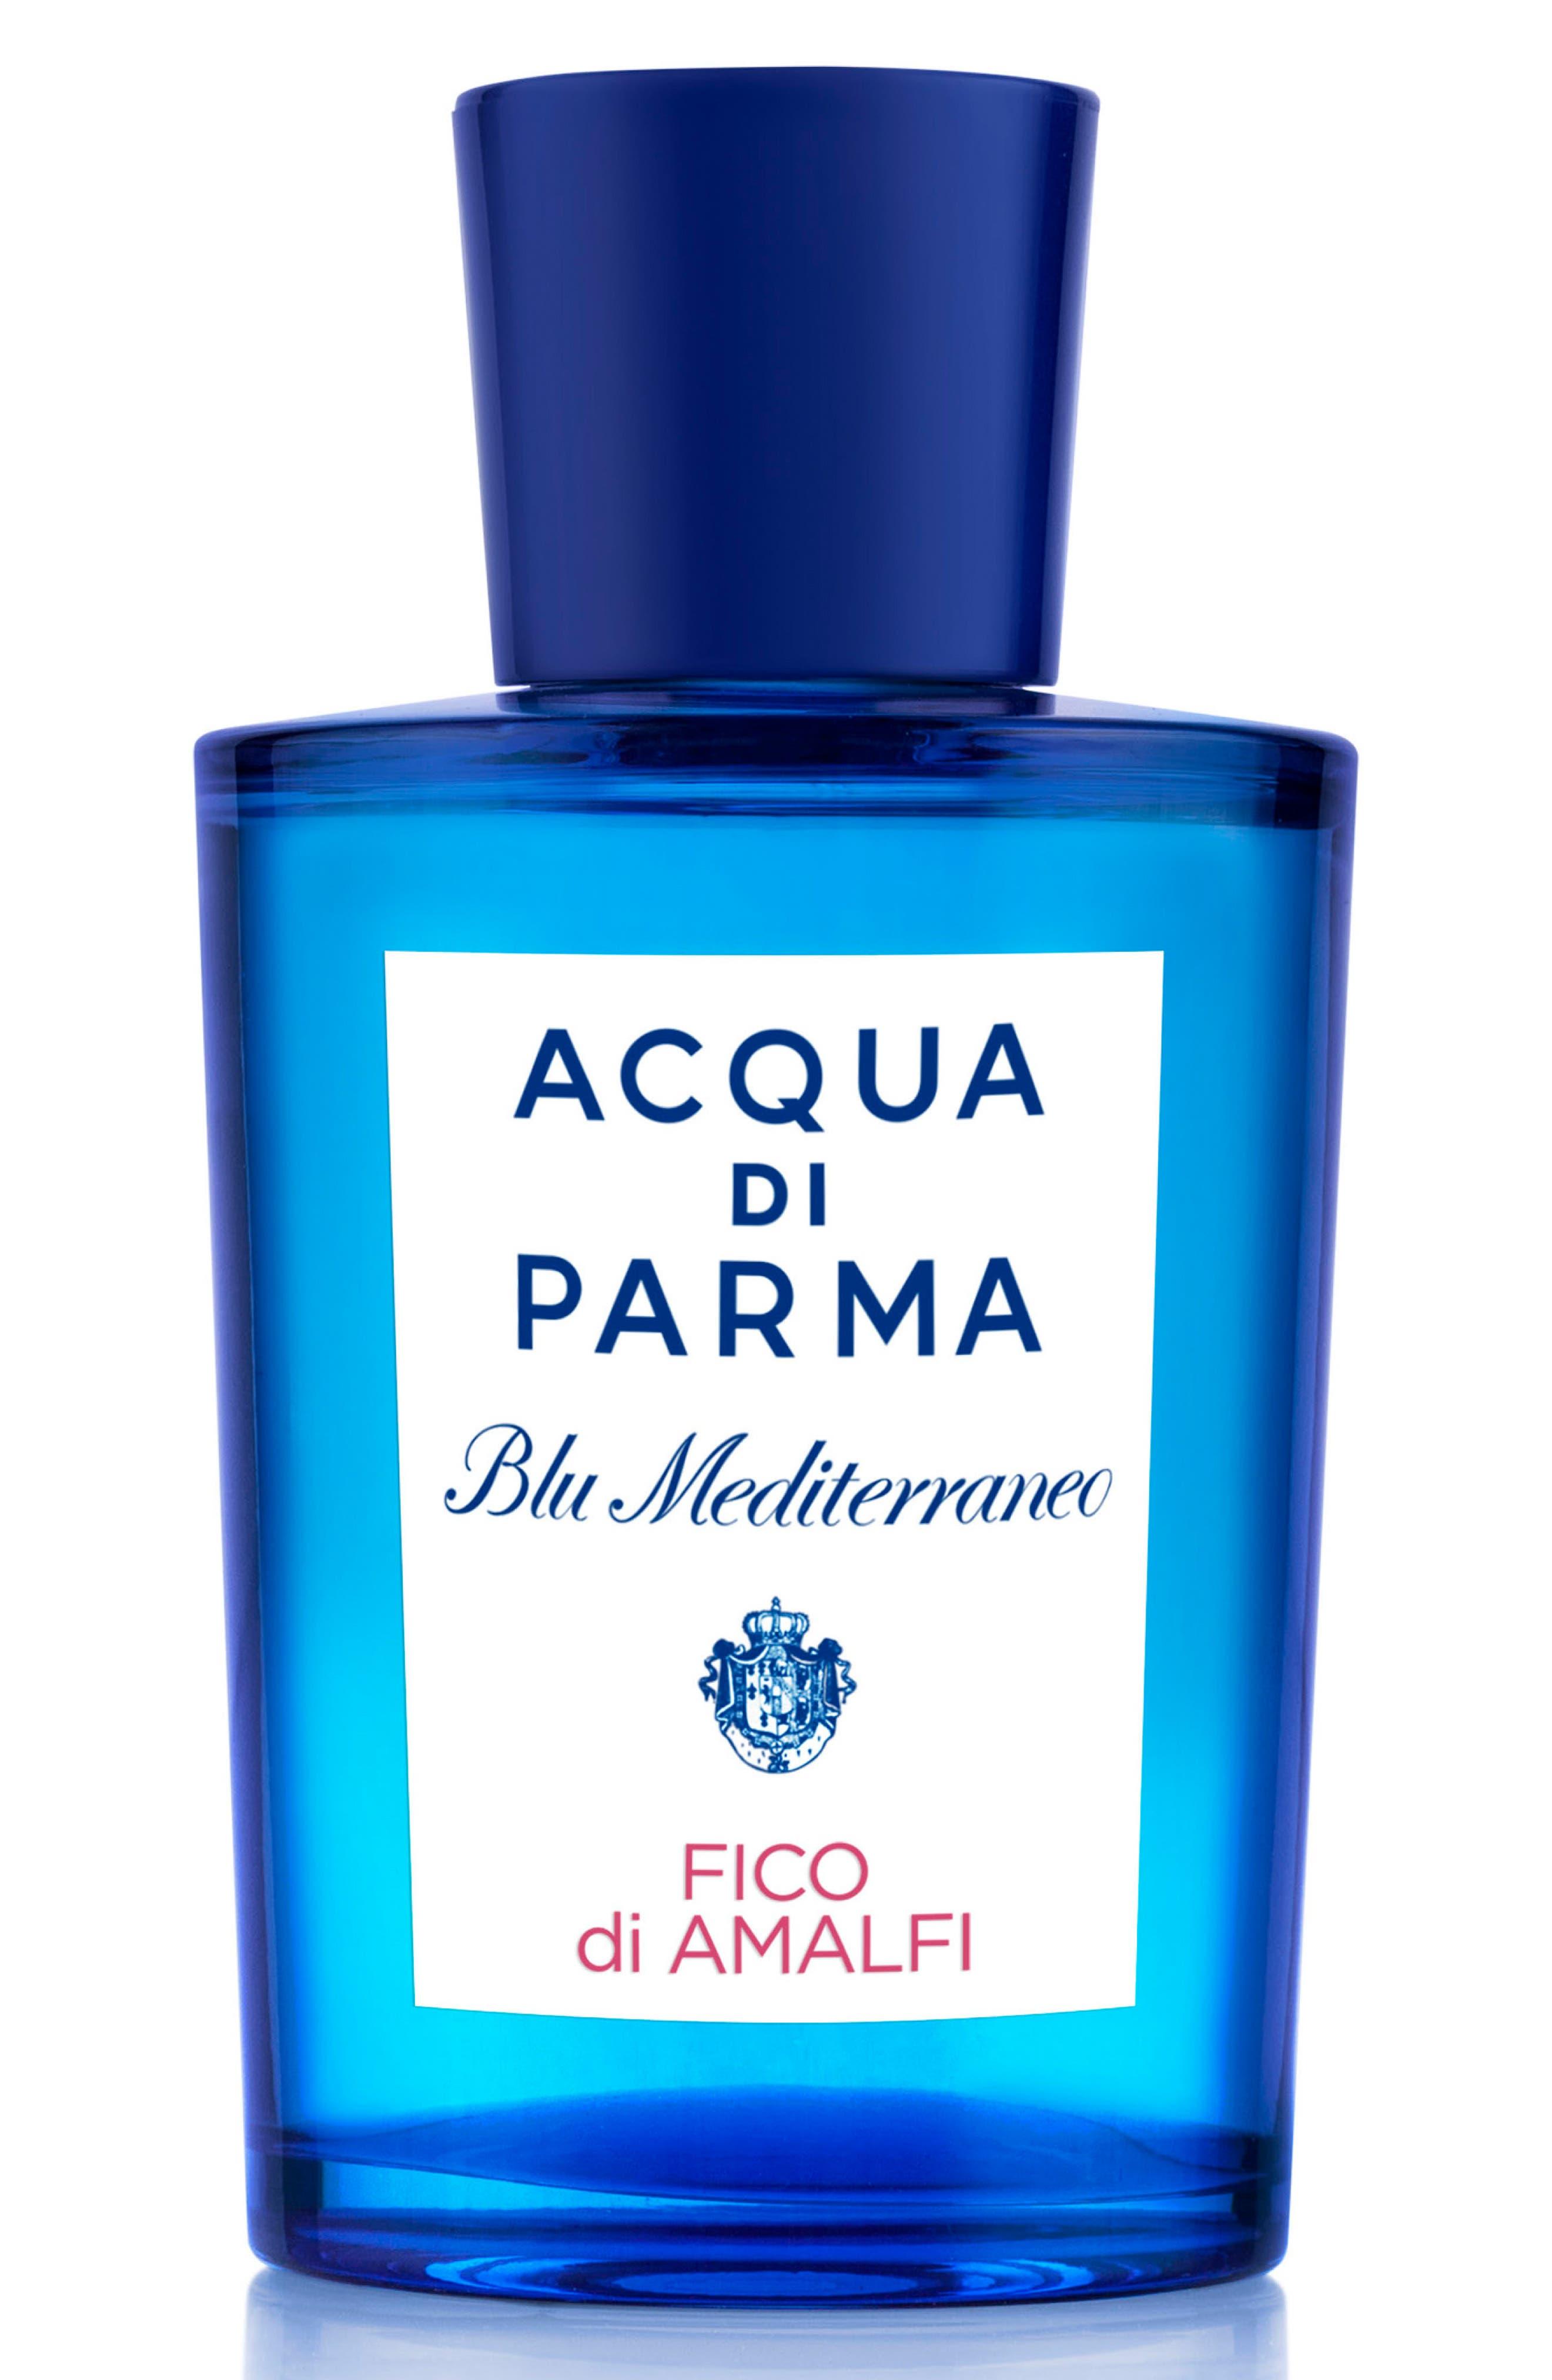 ACQUA DI PARMA, 'Blu Mediterraneo' Fico di Amalfi Eau de Toilette Spray, Main thumbnail 1, color, NO COLOR